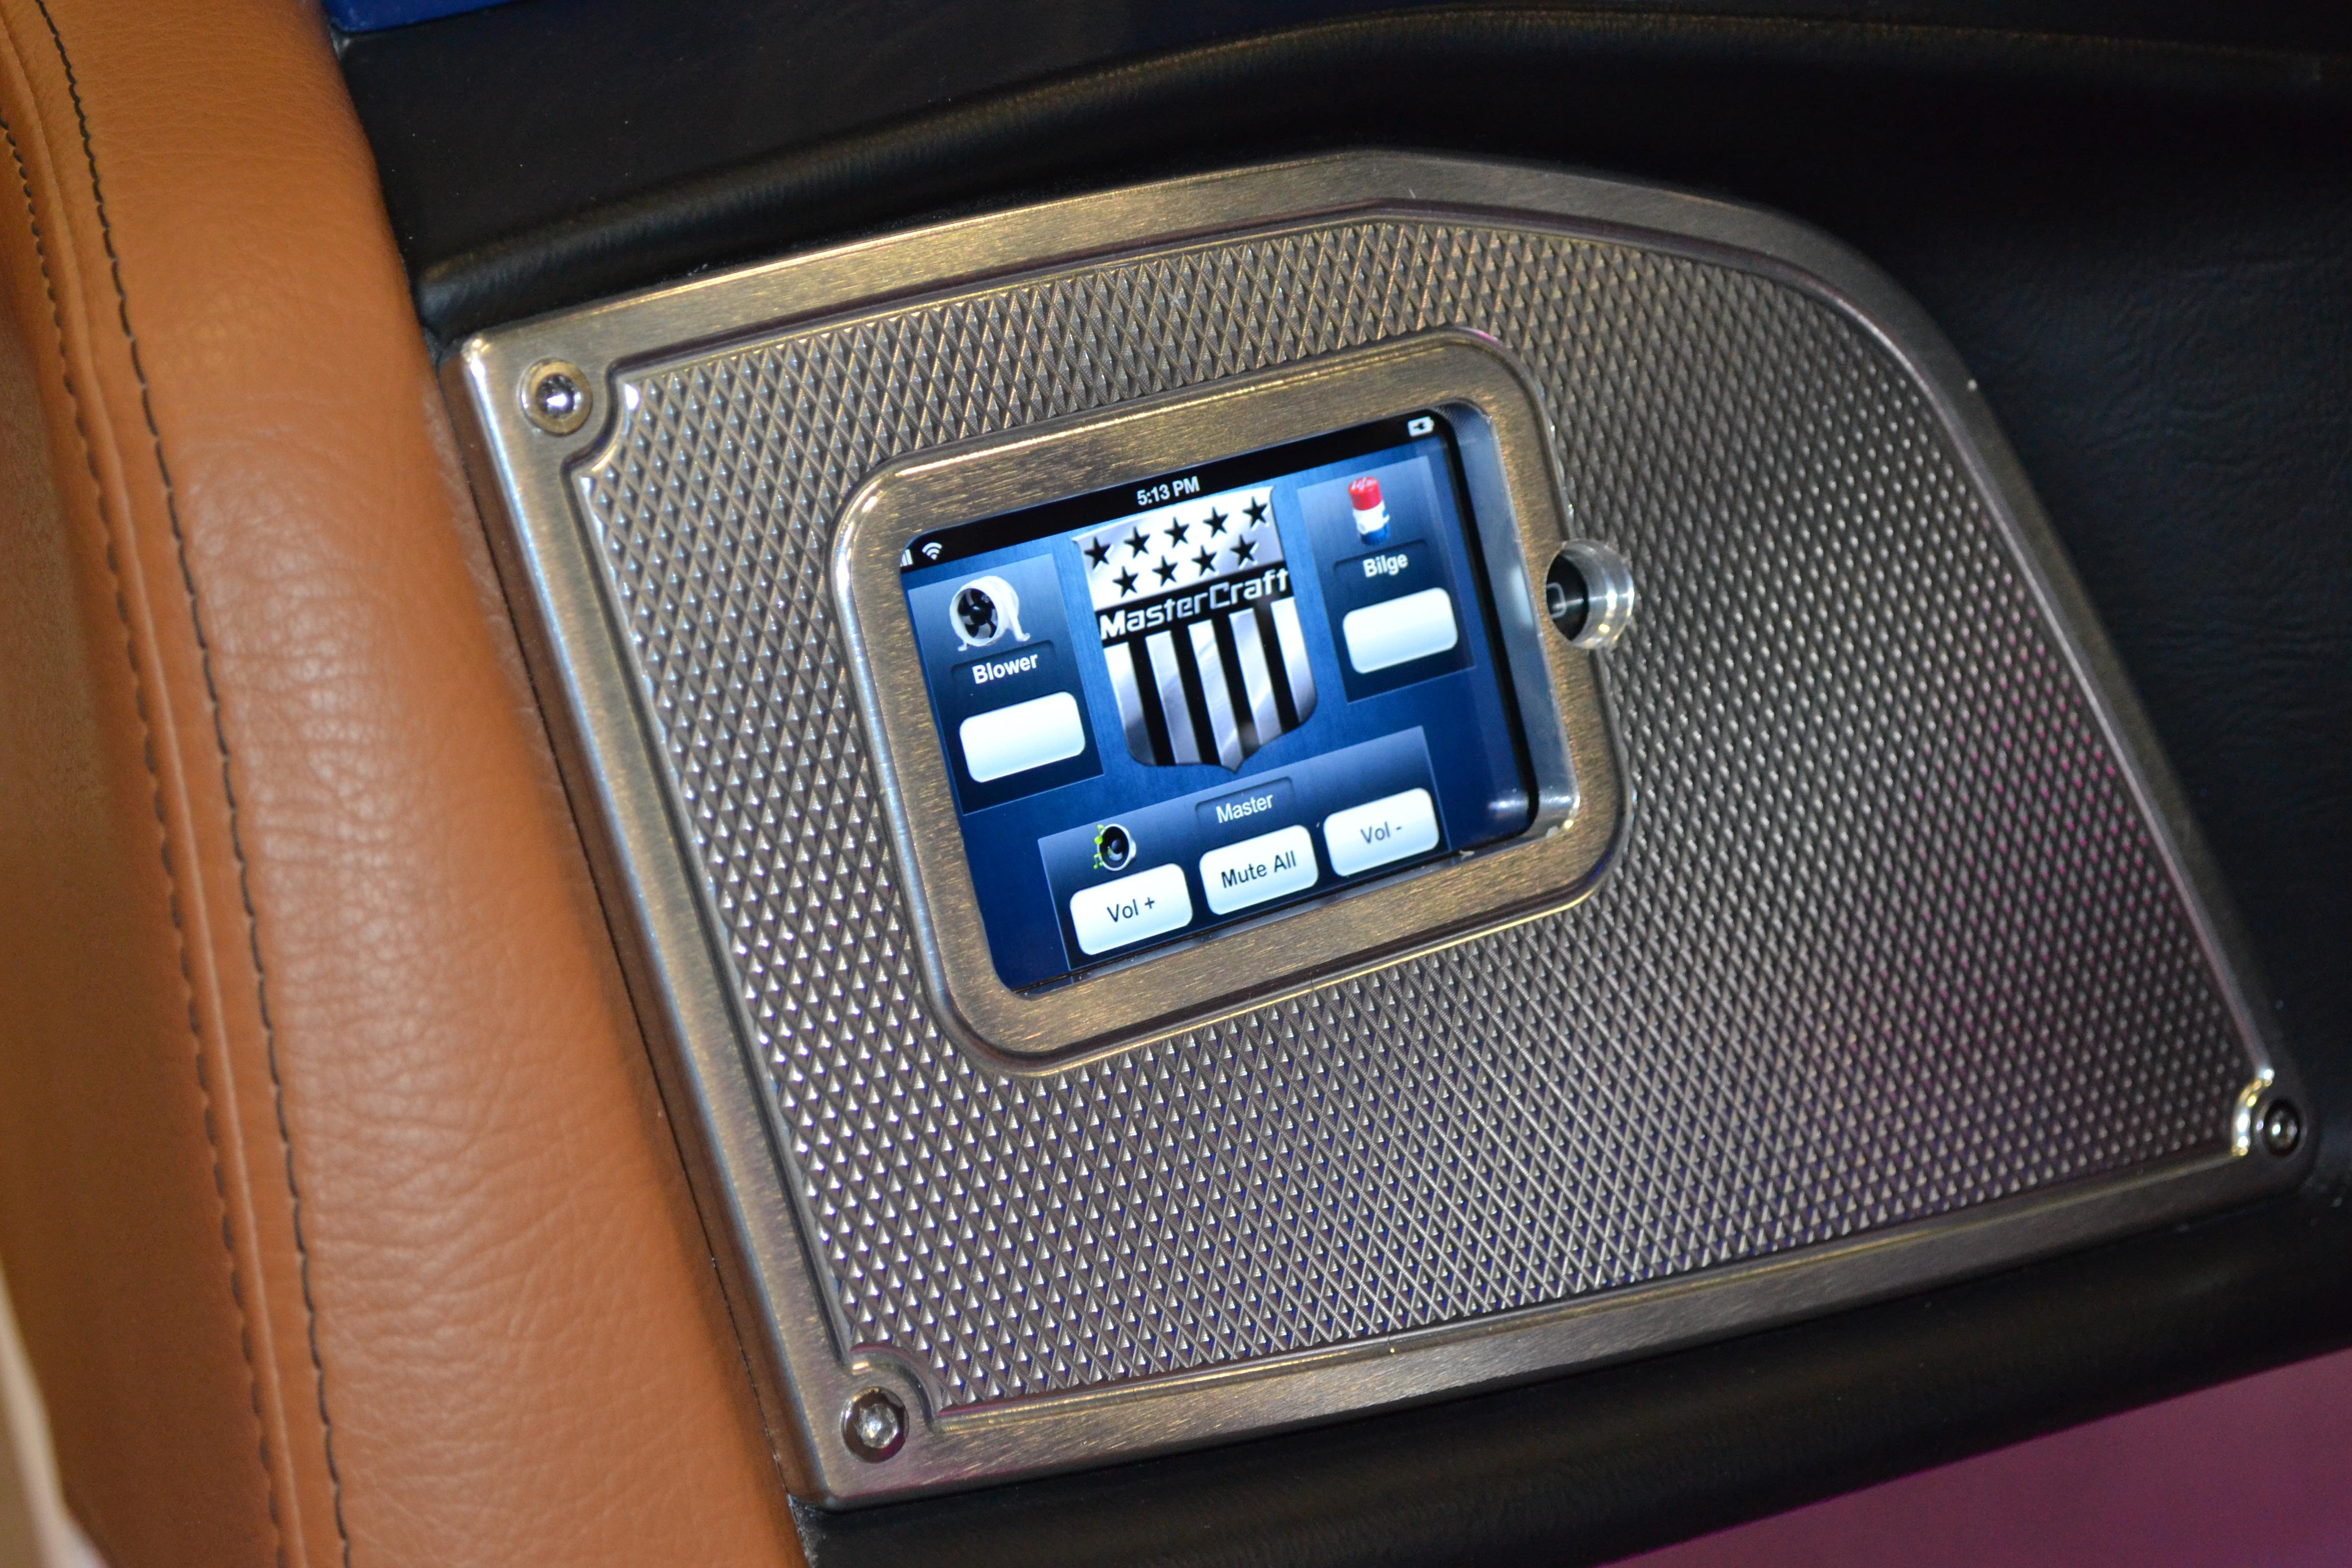 2013 Mastercraft X30 Crestron Wet Sounds XS-808 8